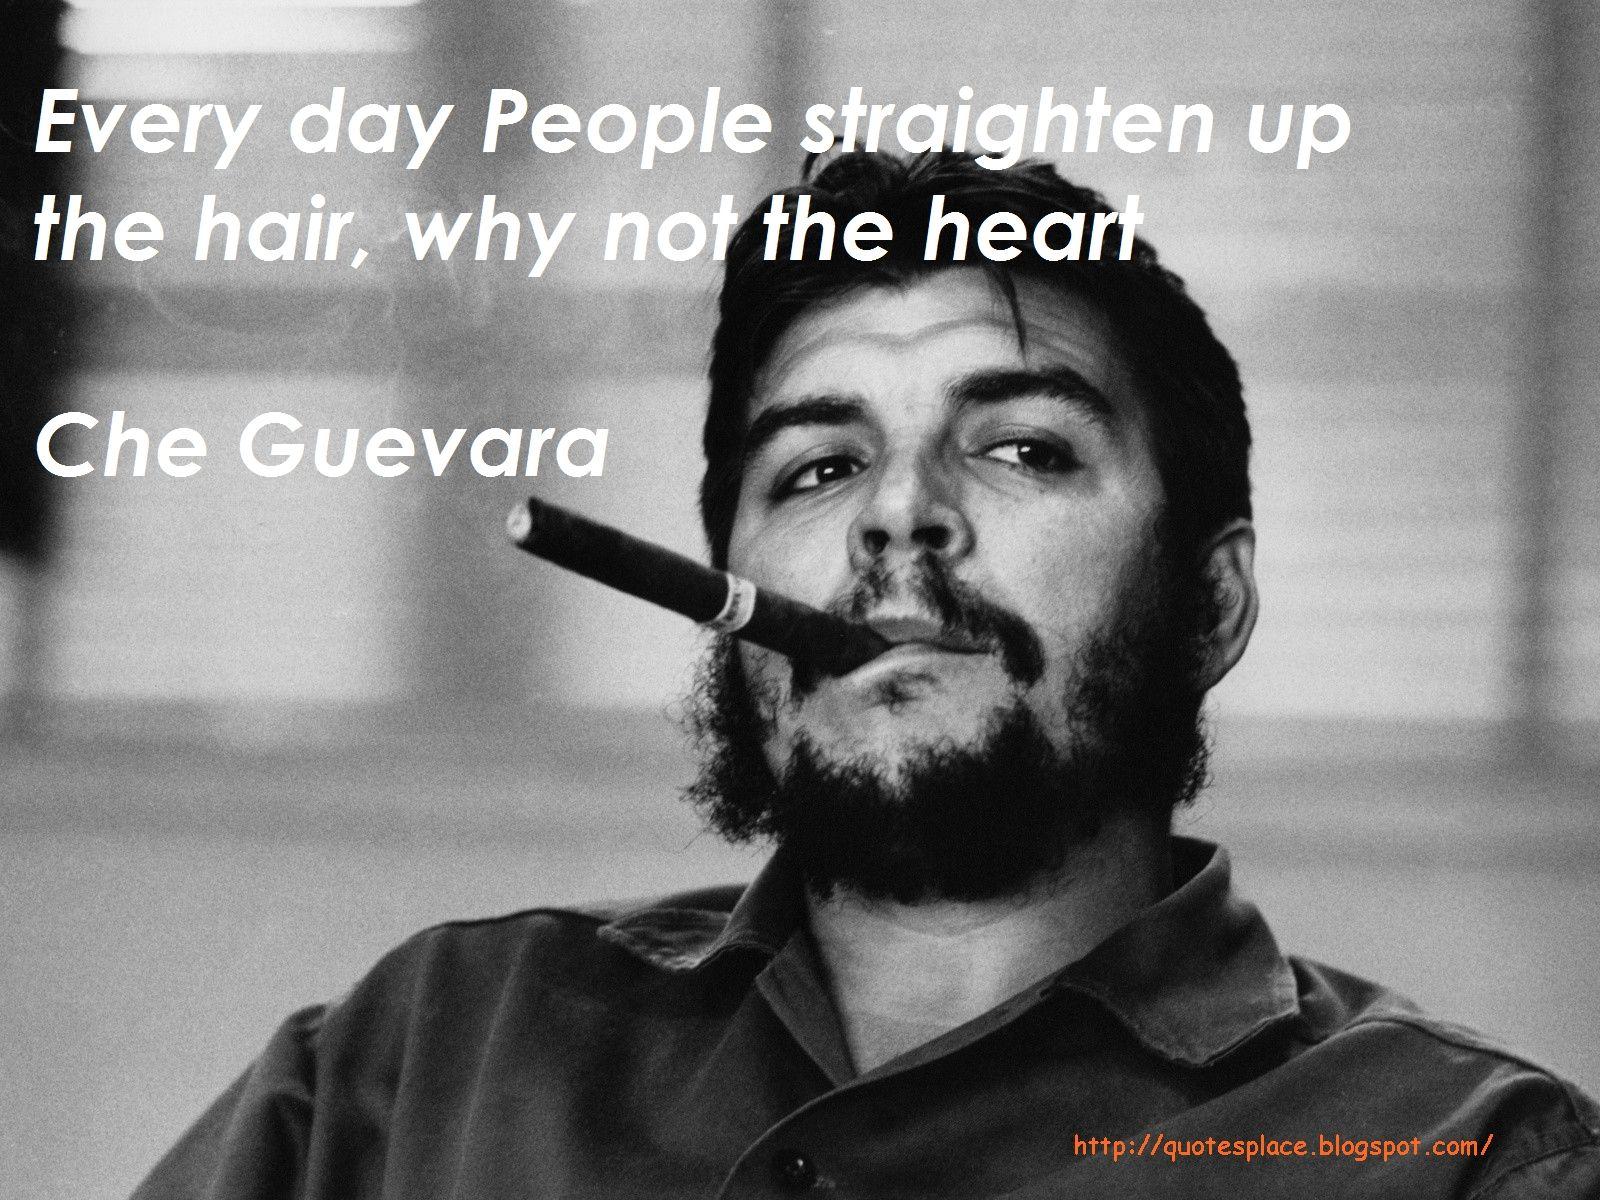 Che Guevara Quotes, Cuban Cigars, Ernesto Che Guevara, Yuri, Fidel Castro,